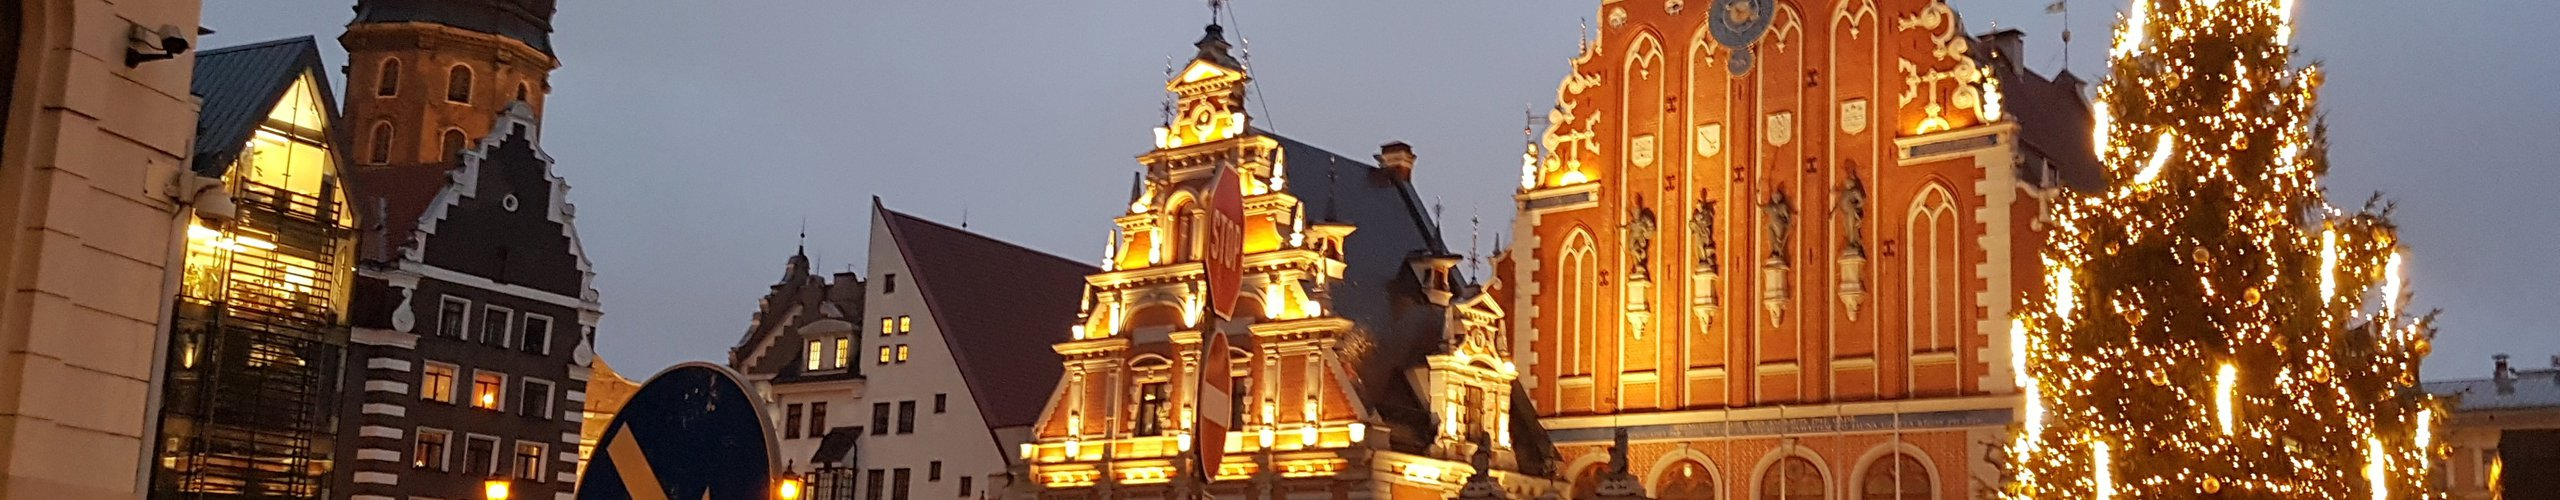 Riga 2019: Best of Riga, Latvia Tourism - TripAdvisor